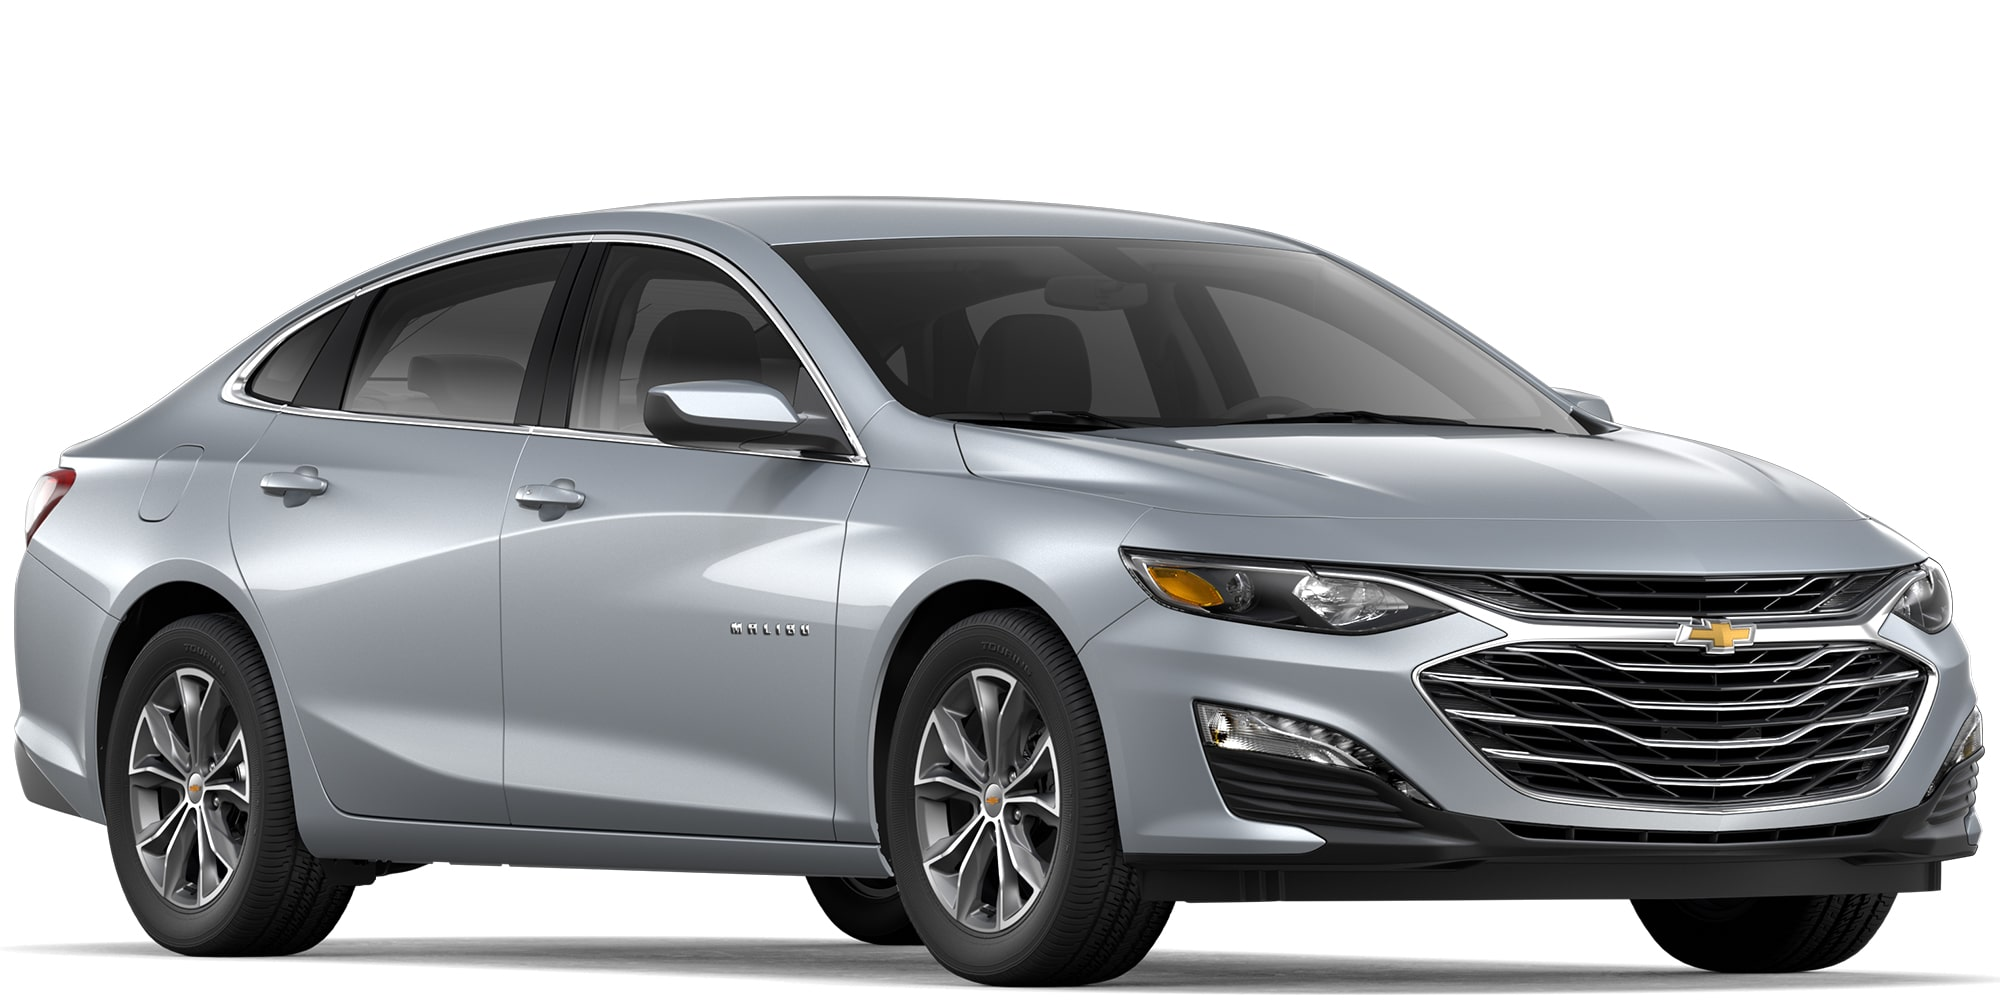 2019 Malibu Midsize Car Available In Hybrid. 2019 Malibu Pare. Chevrolet. Chevy Malibu 2 4l Twin Cam Diagram At Scoala.co